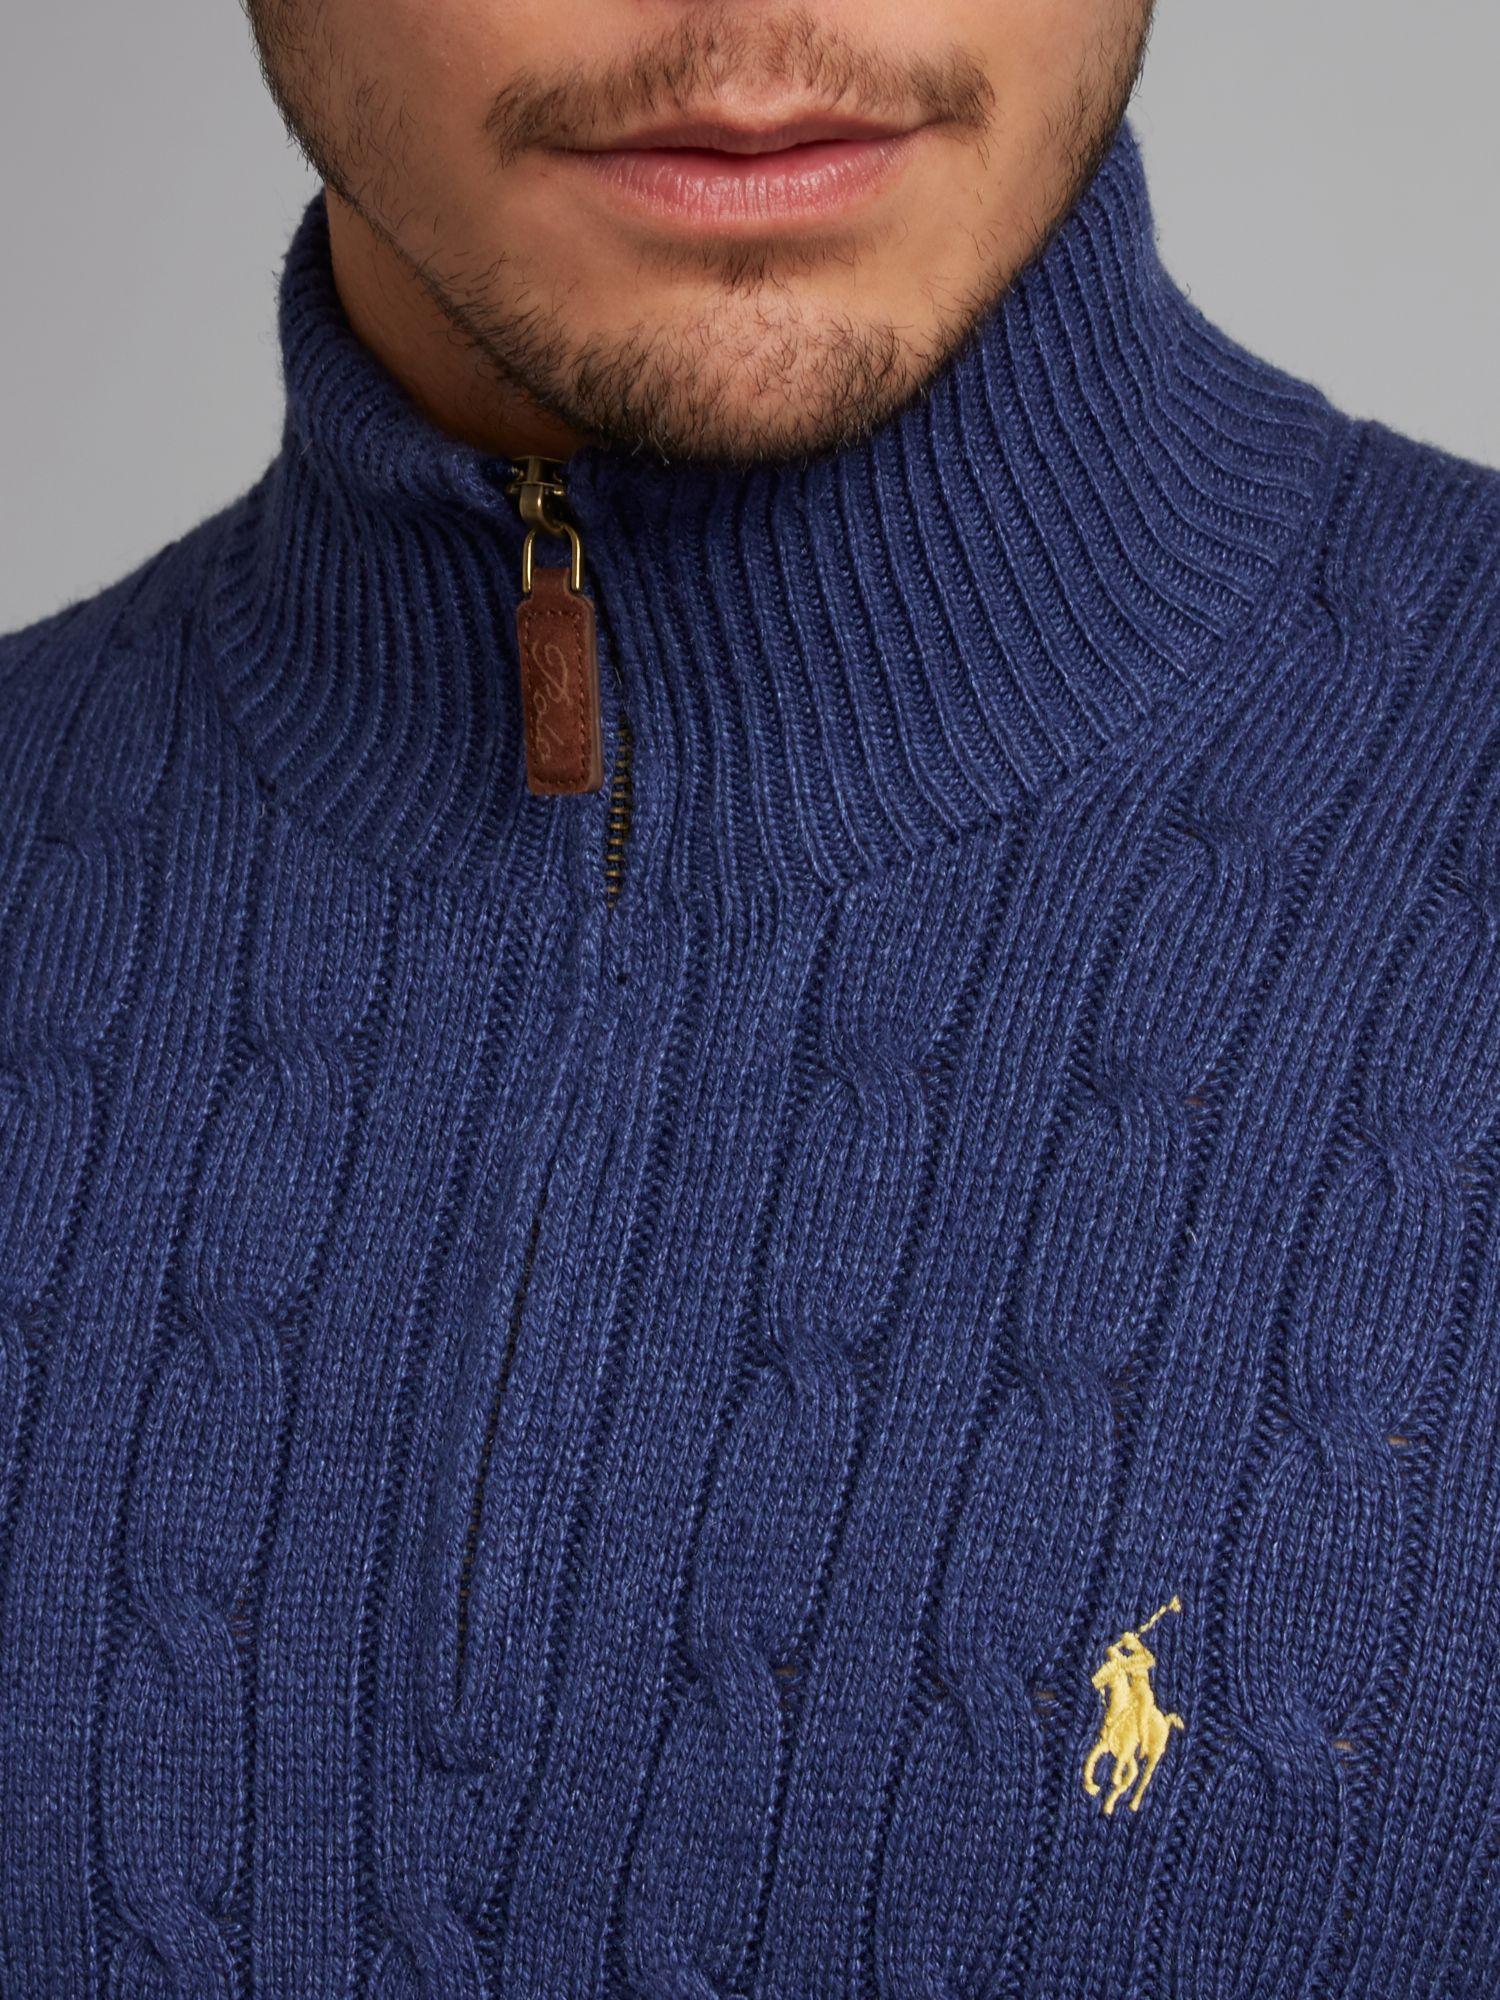 Polo ralph lauren Cable Knit Half Zip Jumper in Blue for Men | Lyst